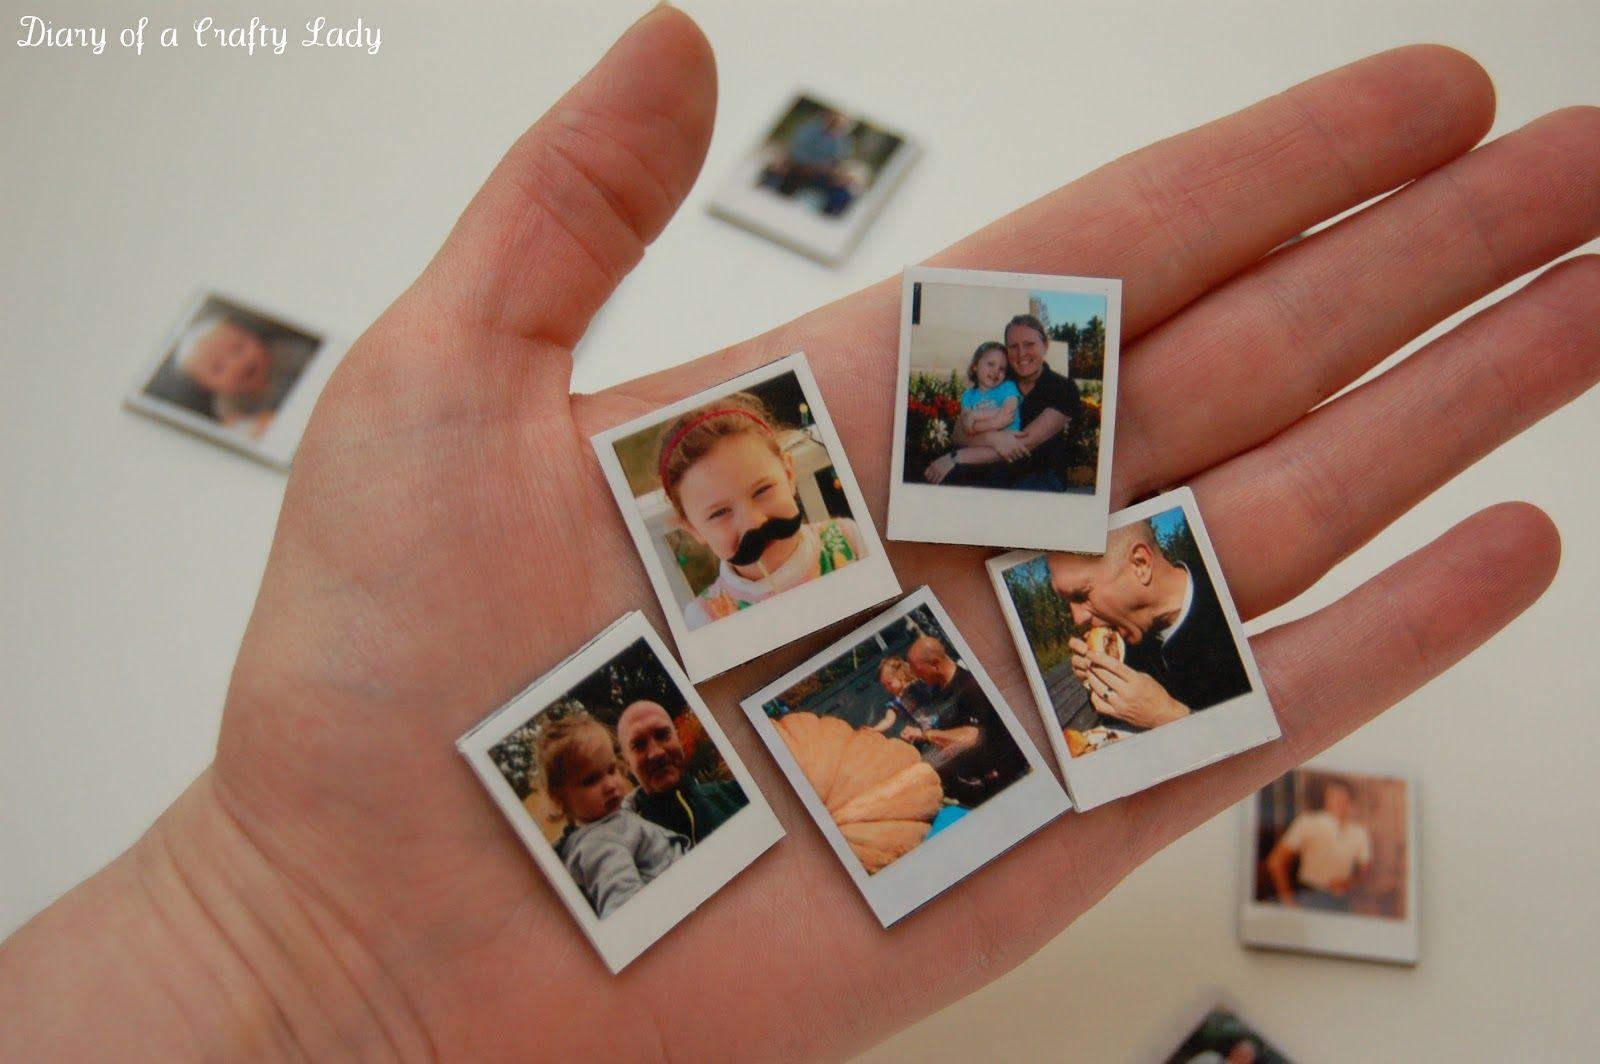 Diary of a Crafty Lady: Mini Polaroid Magnets